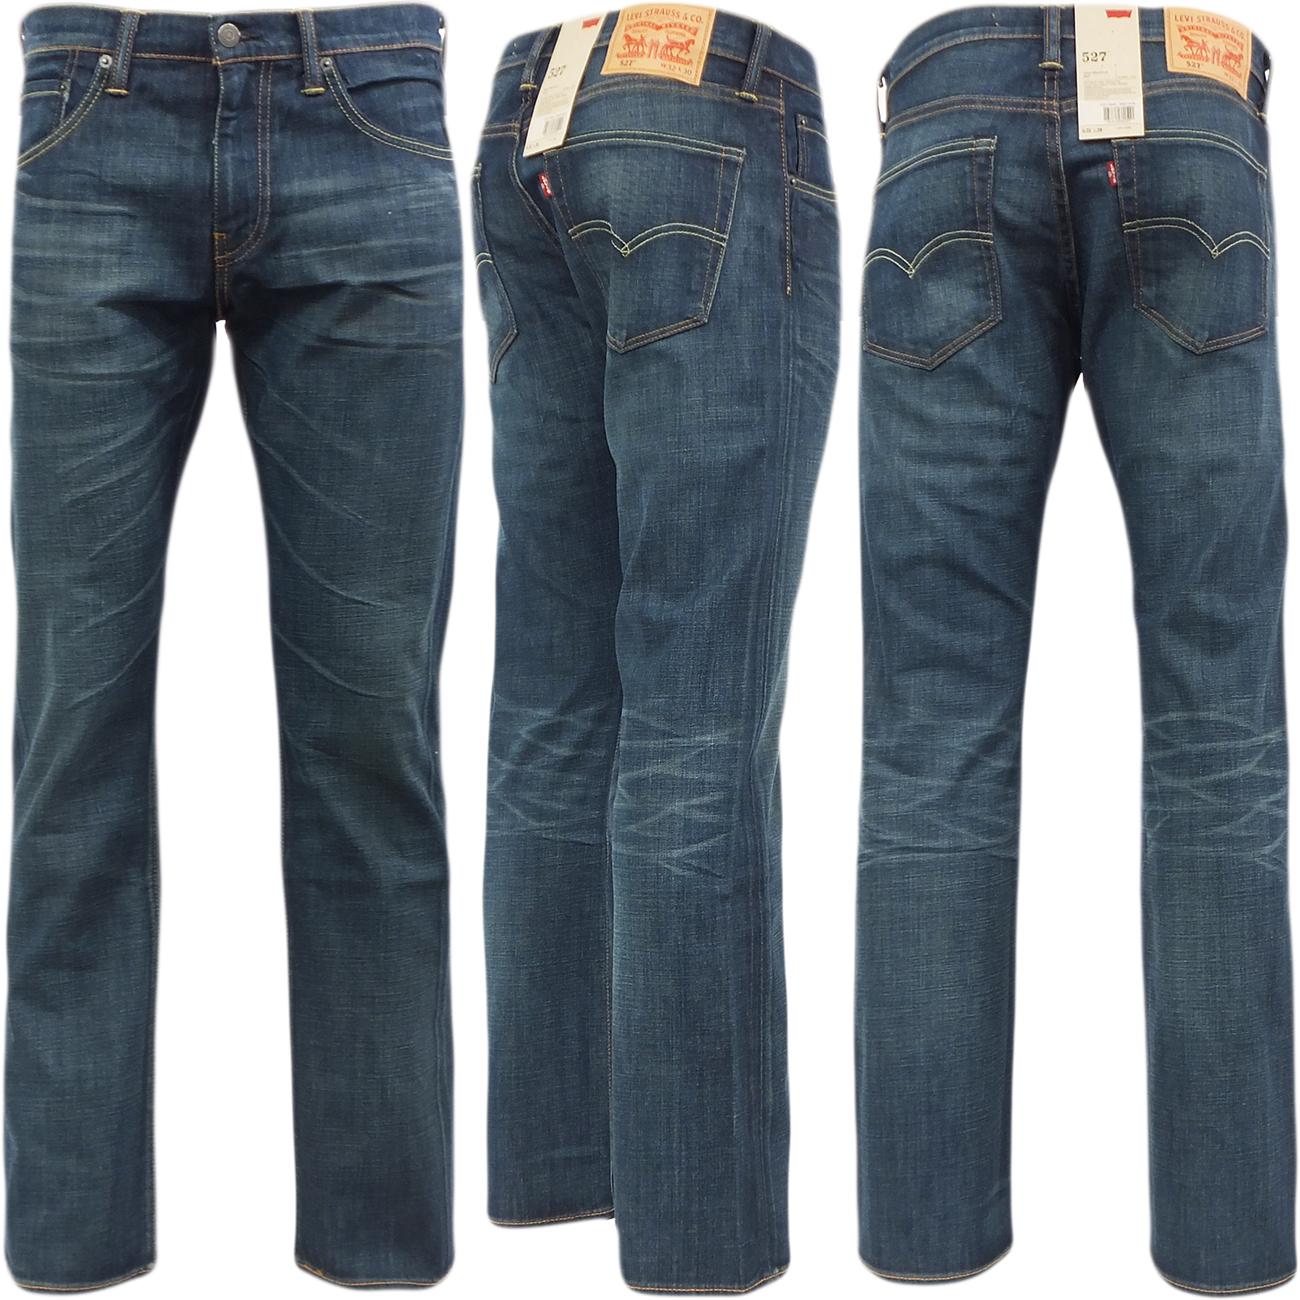 levi strauss 527 bootcut jean 39 explorer 39 denim pant jeans mr h menswear. Black Bedroom Furniture Sets. Home Design Ideas